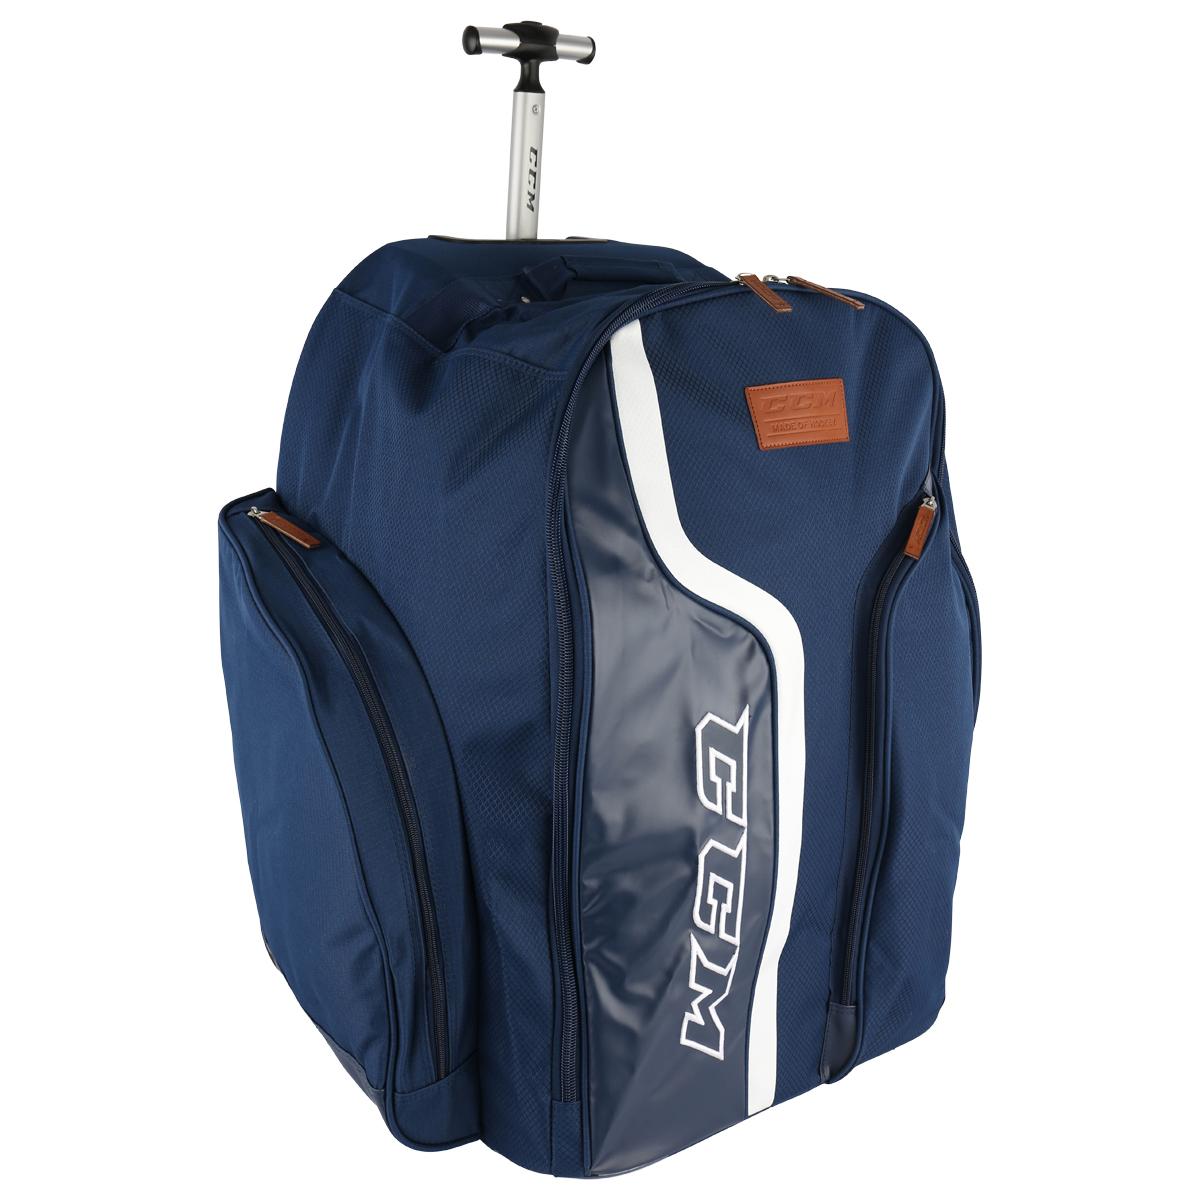 Рюкзак ссм для хоккея walker рюкзаки москва